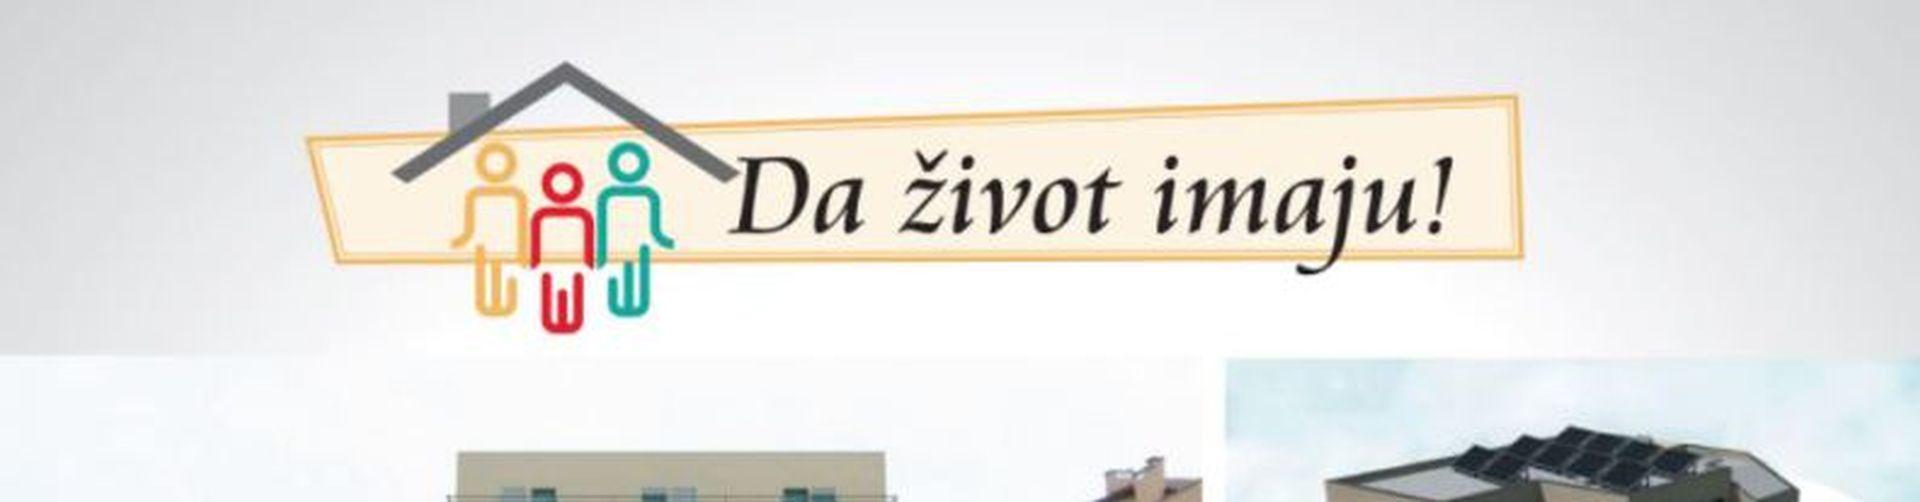 "Caritas Zagrebačke nadbiskupije – ""Da život imaju"""